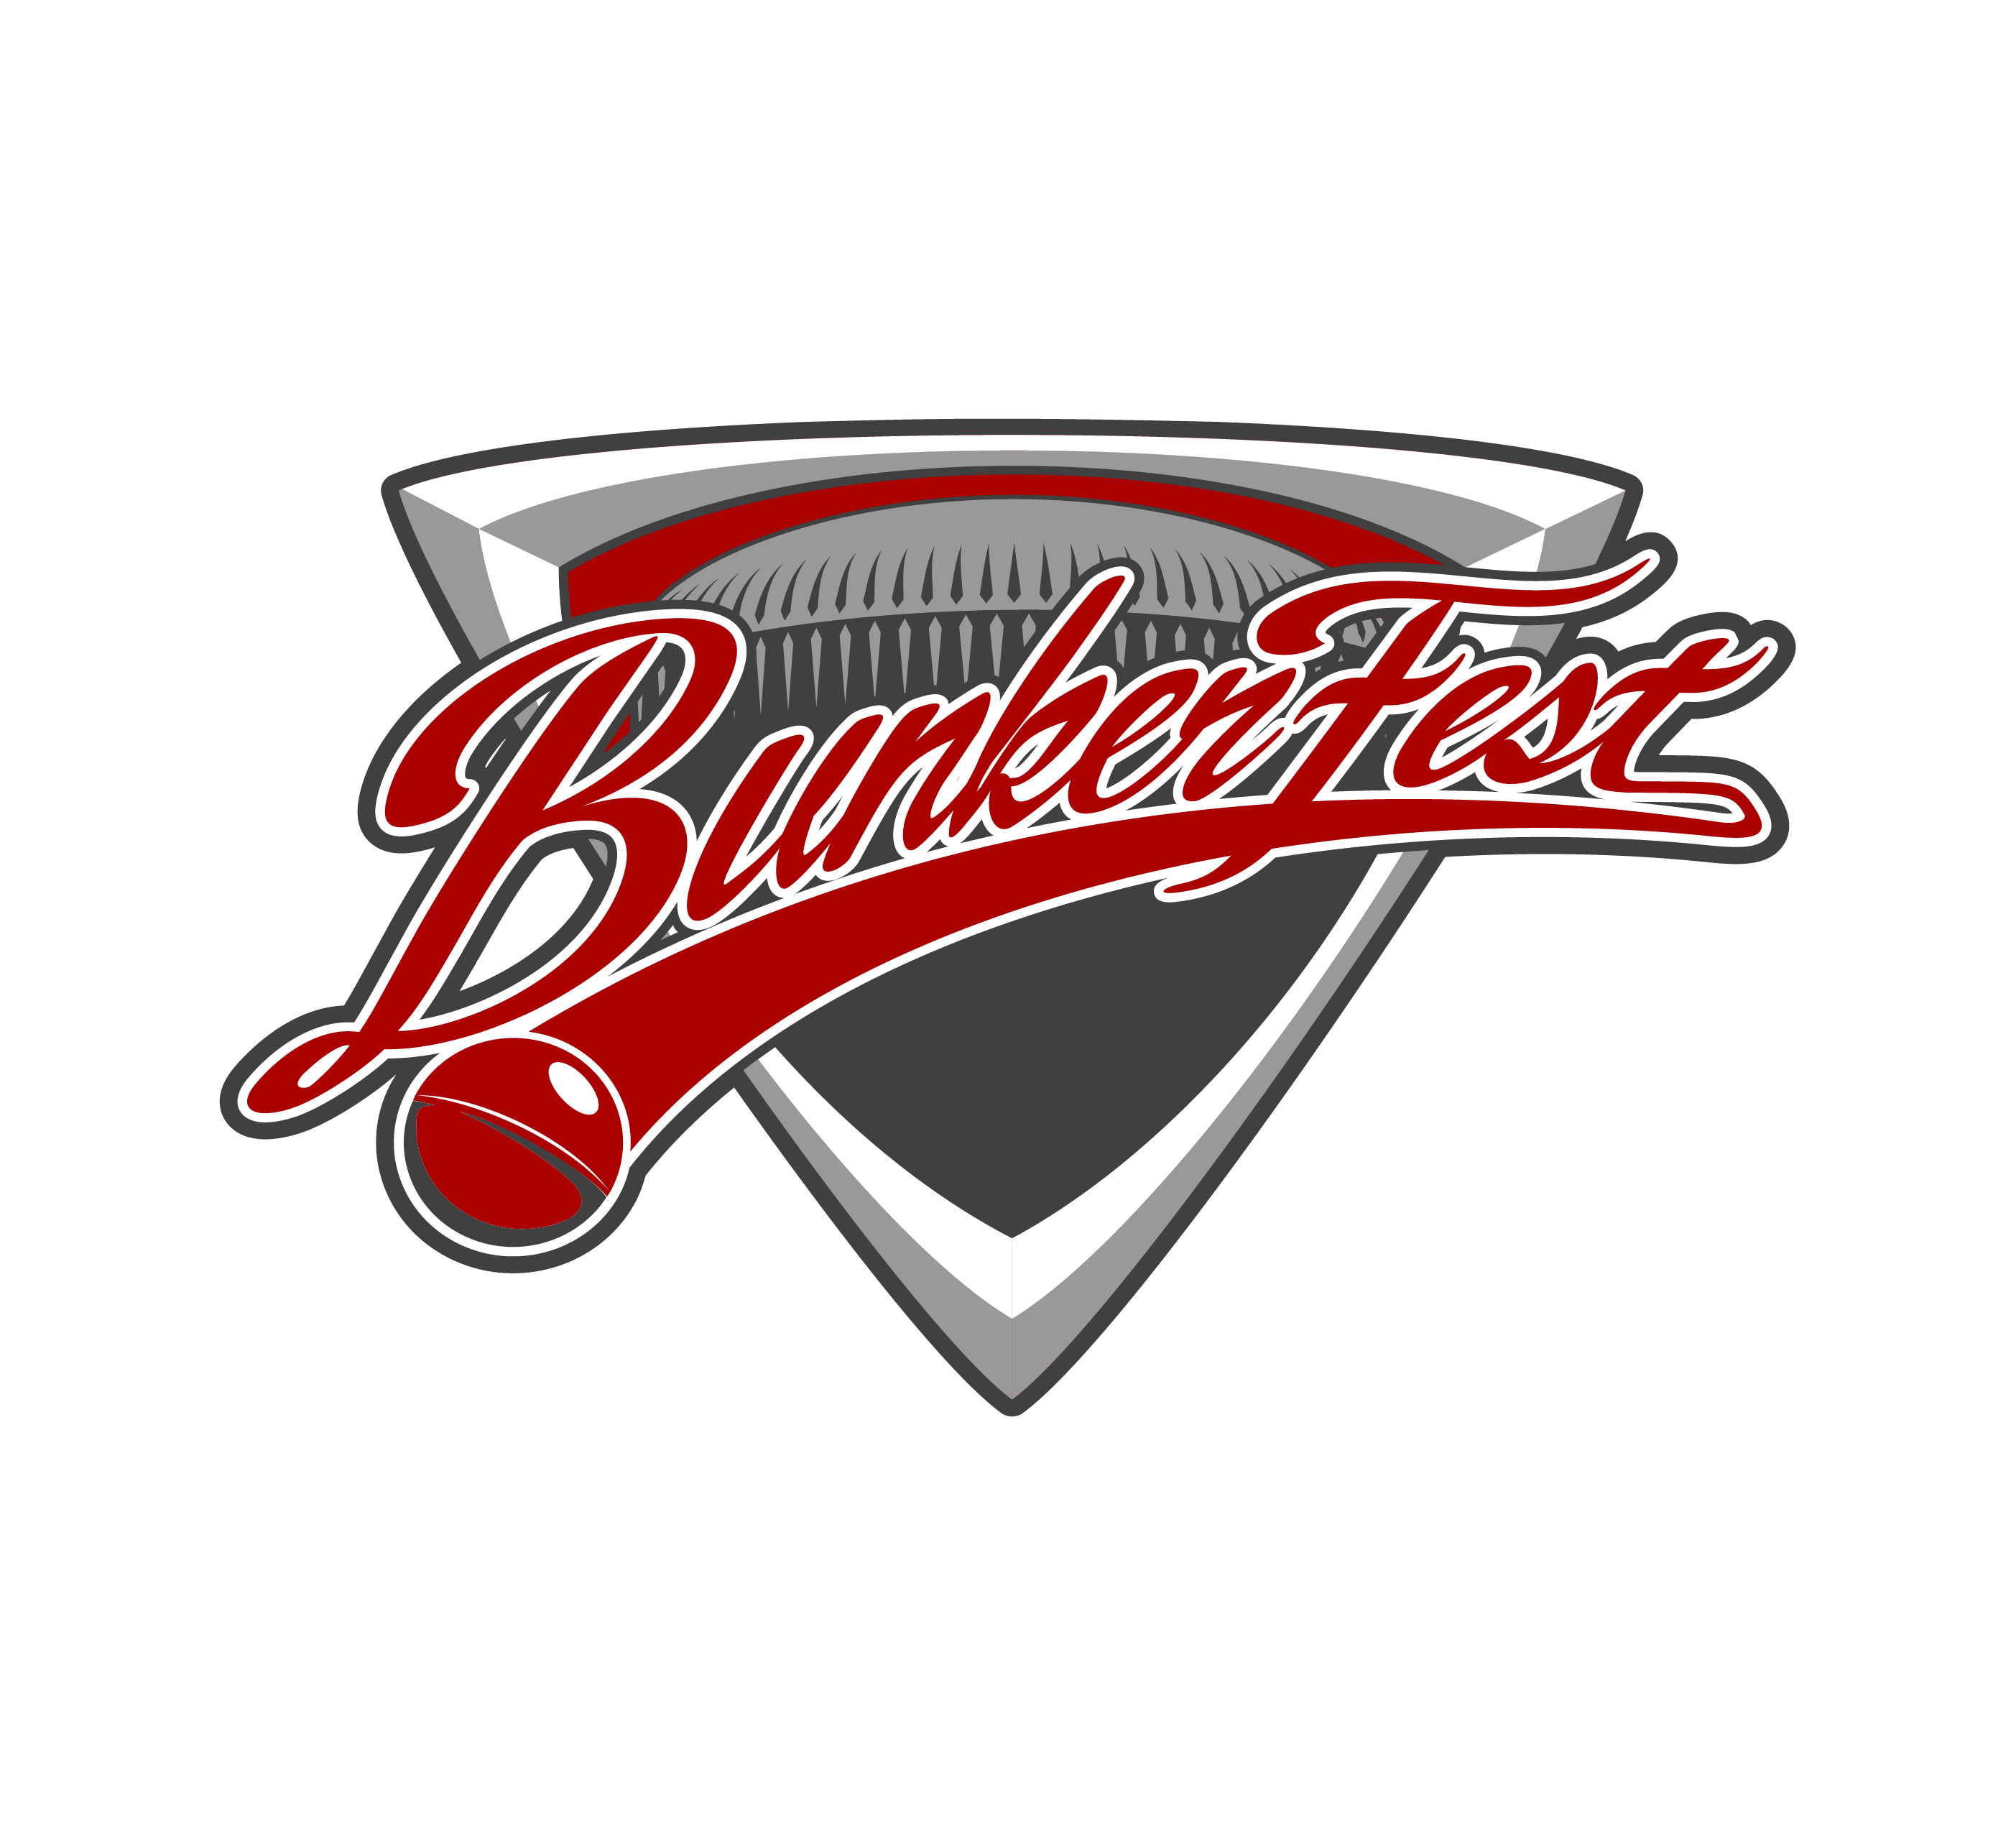 Bunkerfest